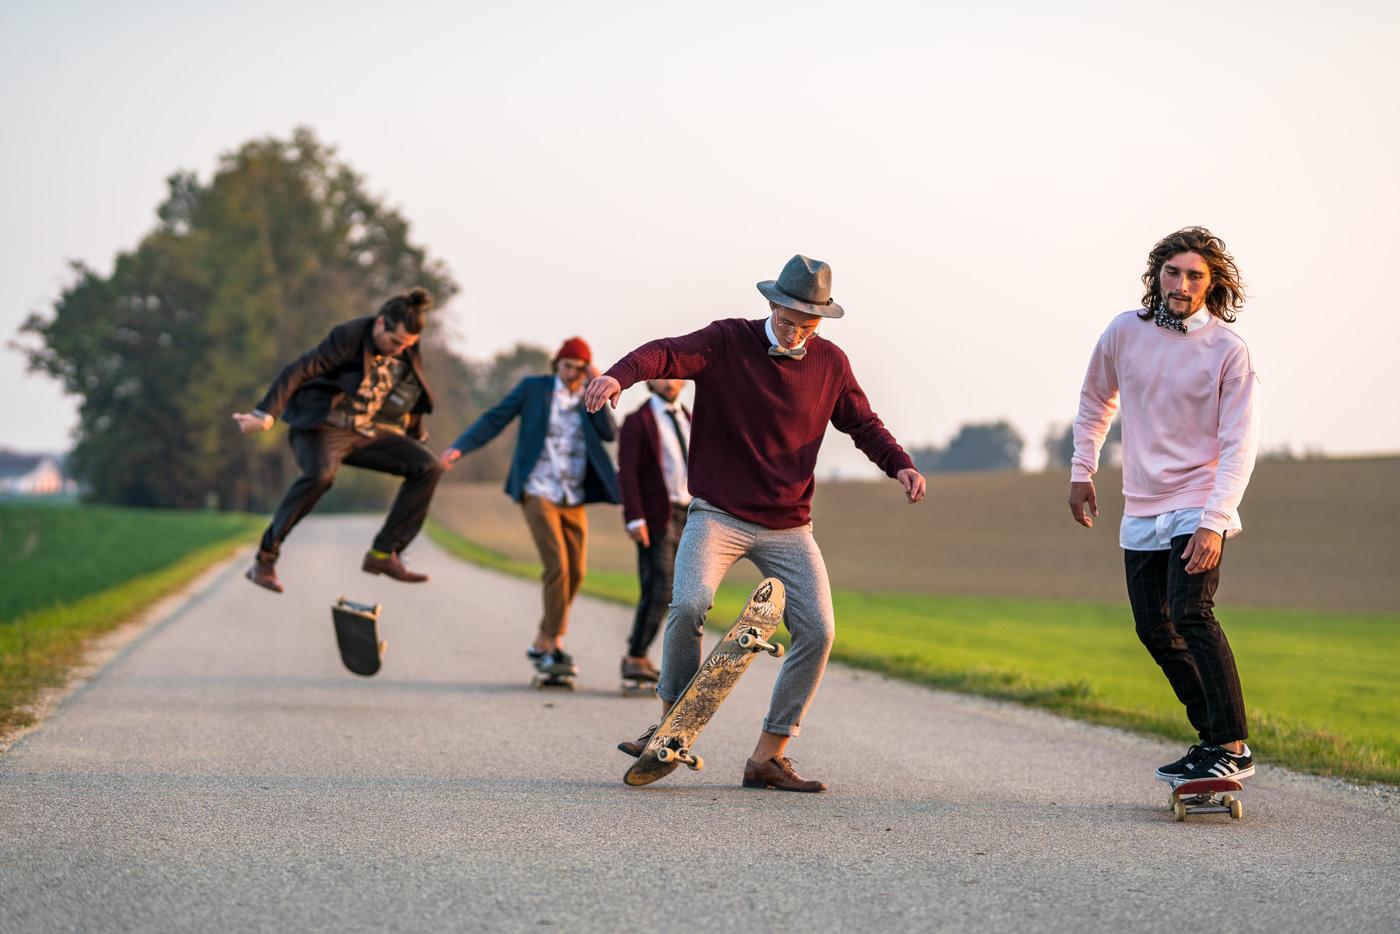 Skate_17